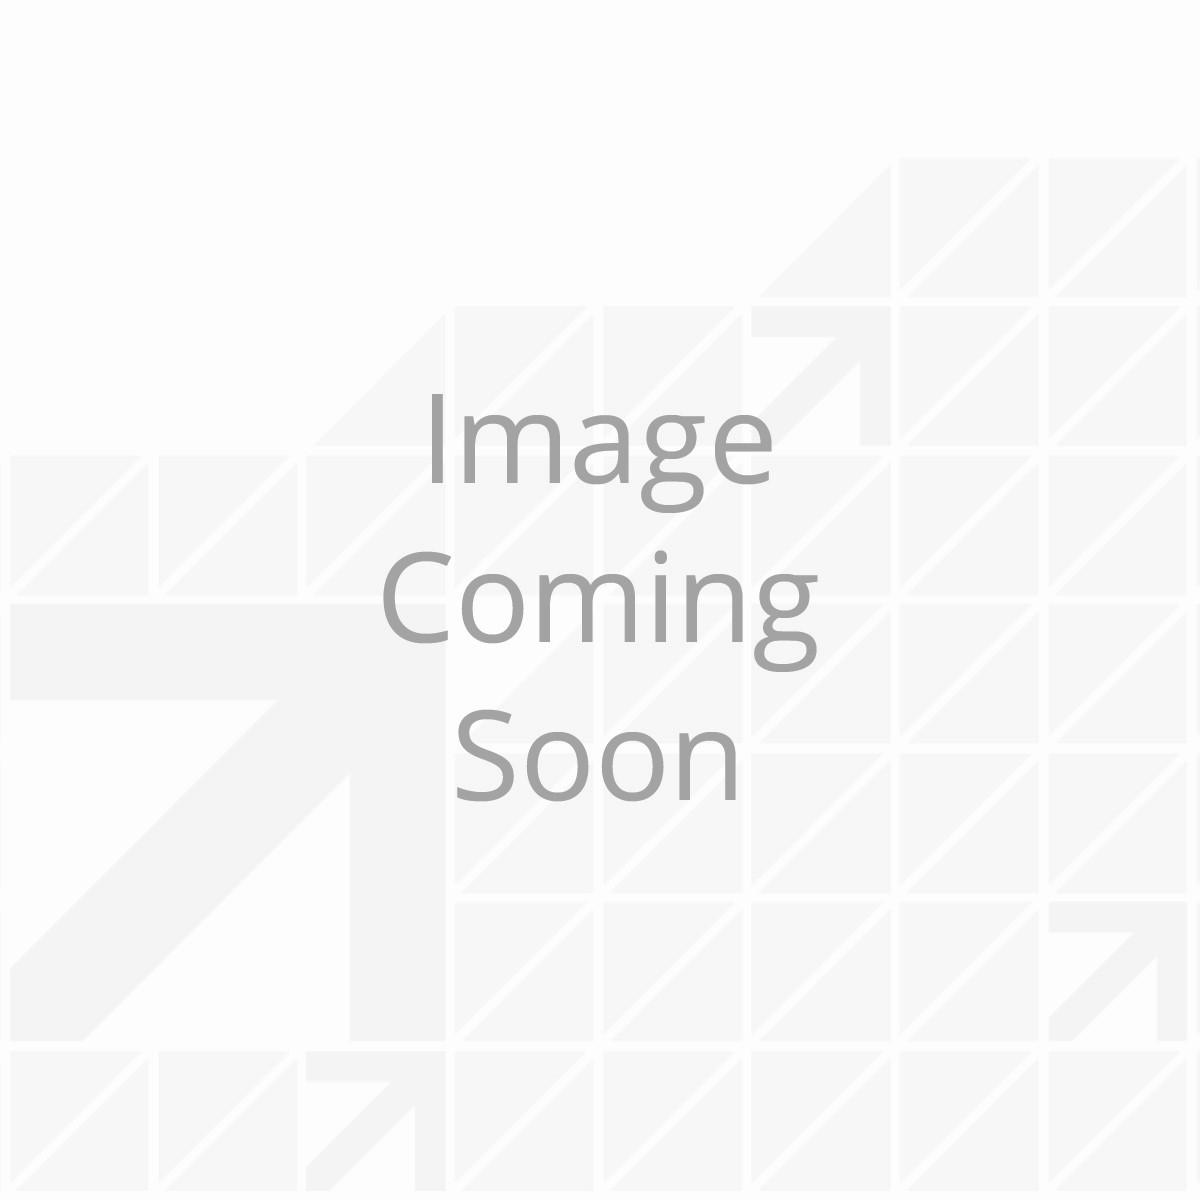 164885_-_tandem_axle_ap_kit_-_001